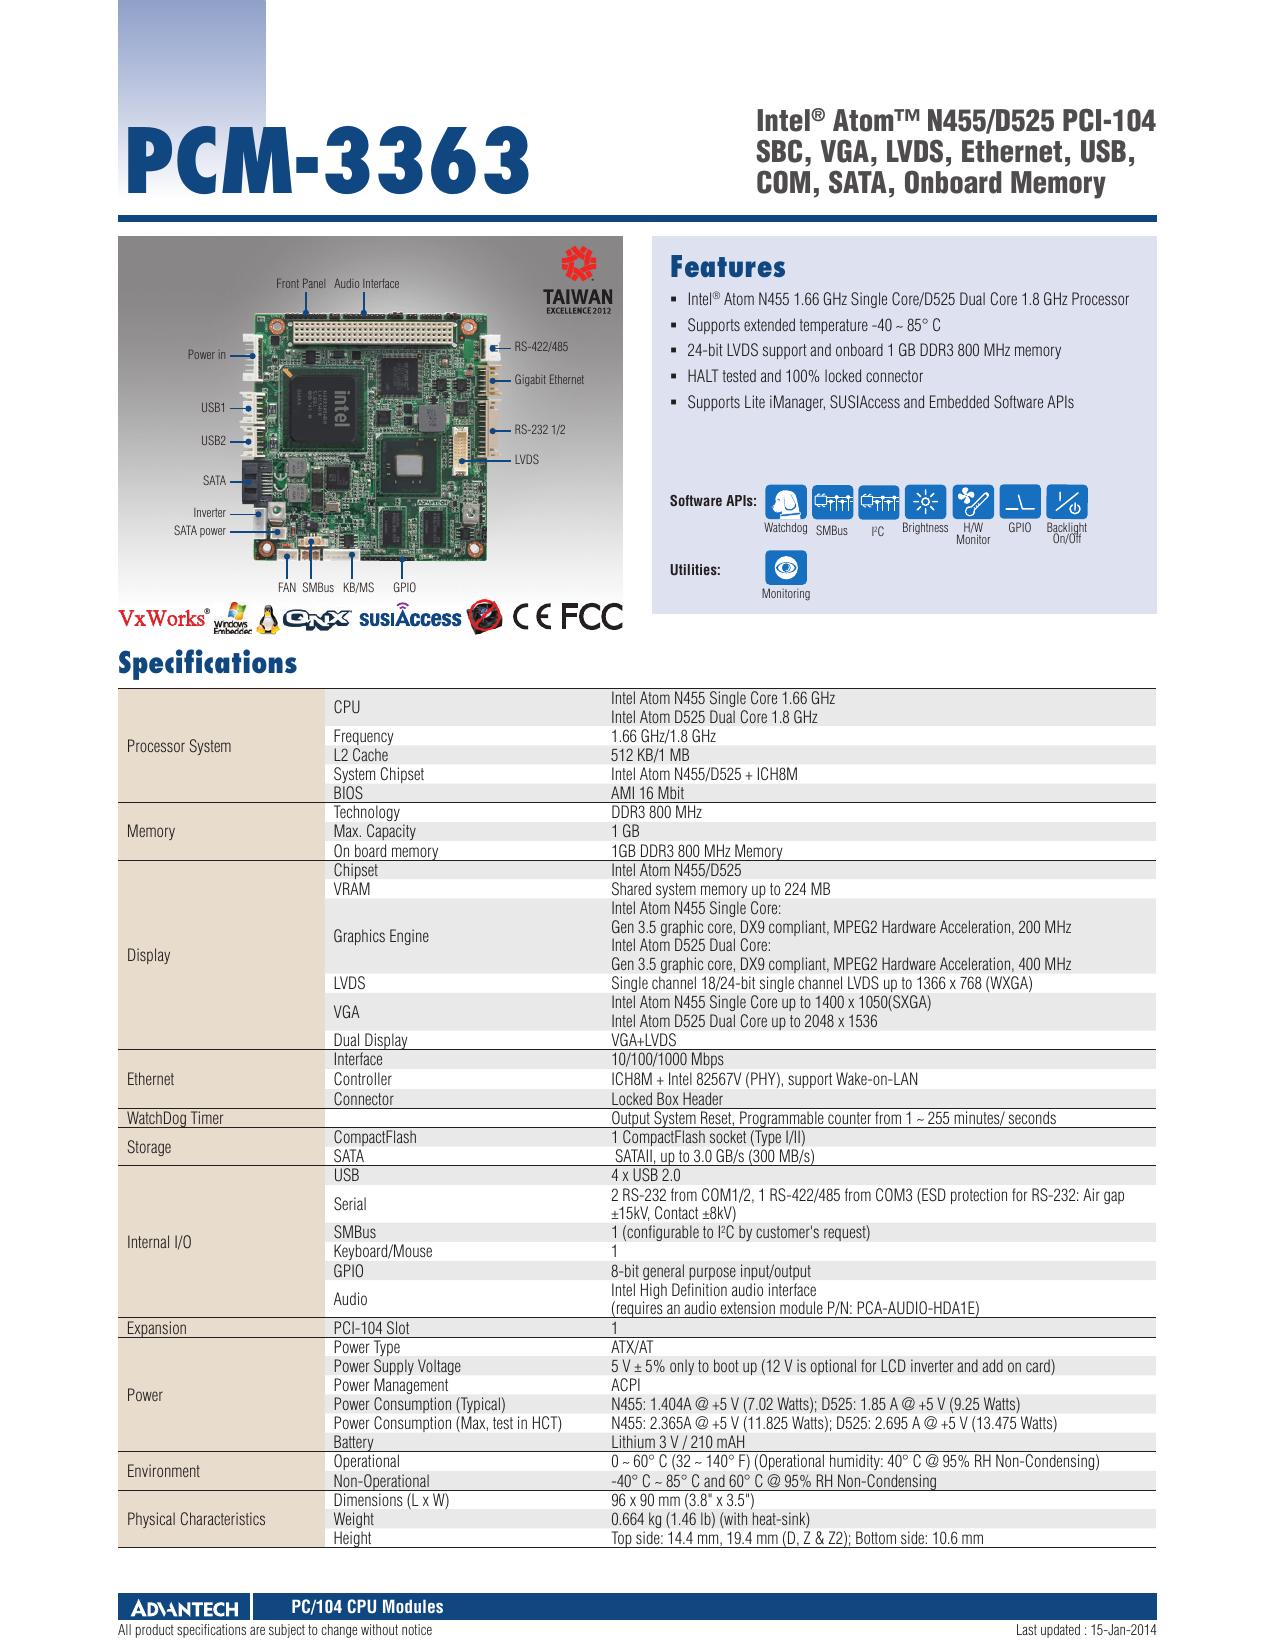 ADVANTECH PCM-3363 REALTEK HD AUDIO WINDOWS 10 DRIVERS DOWNLOAD